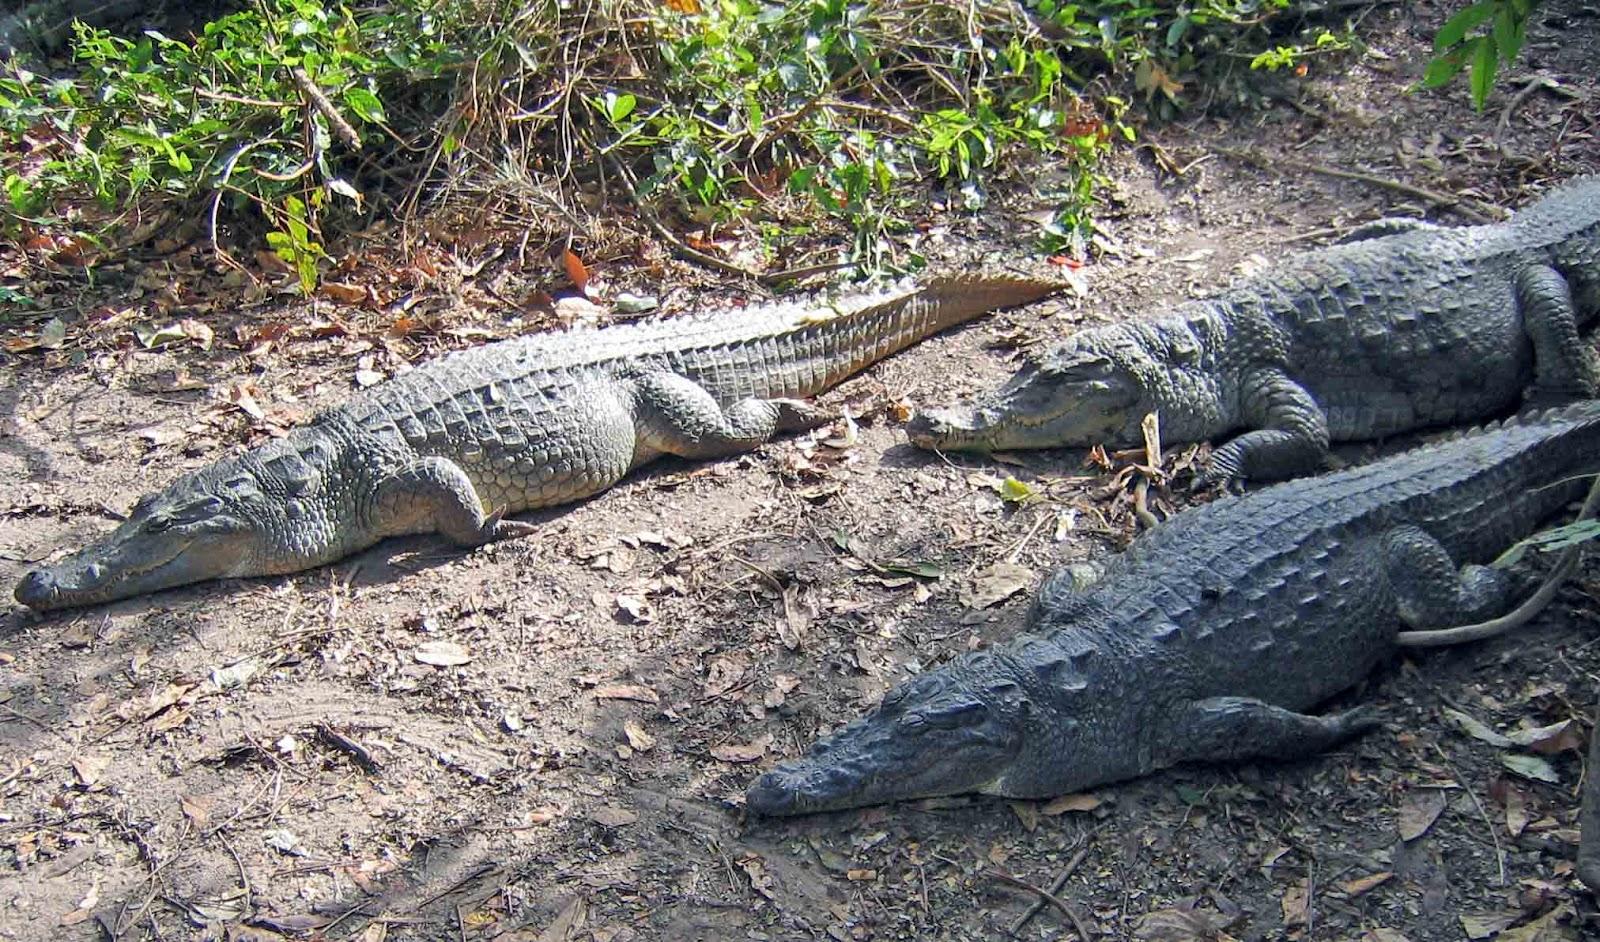 Crocodile Eating Elephant What The Crocodile Eating